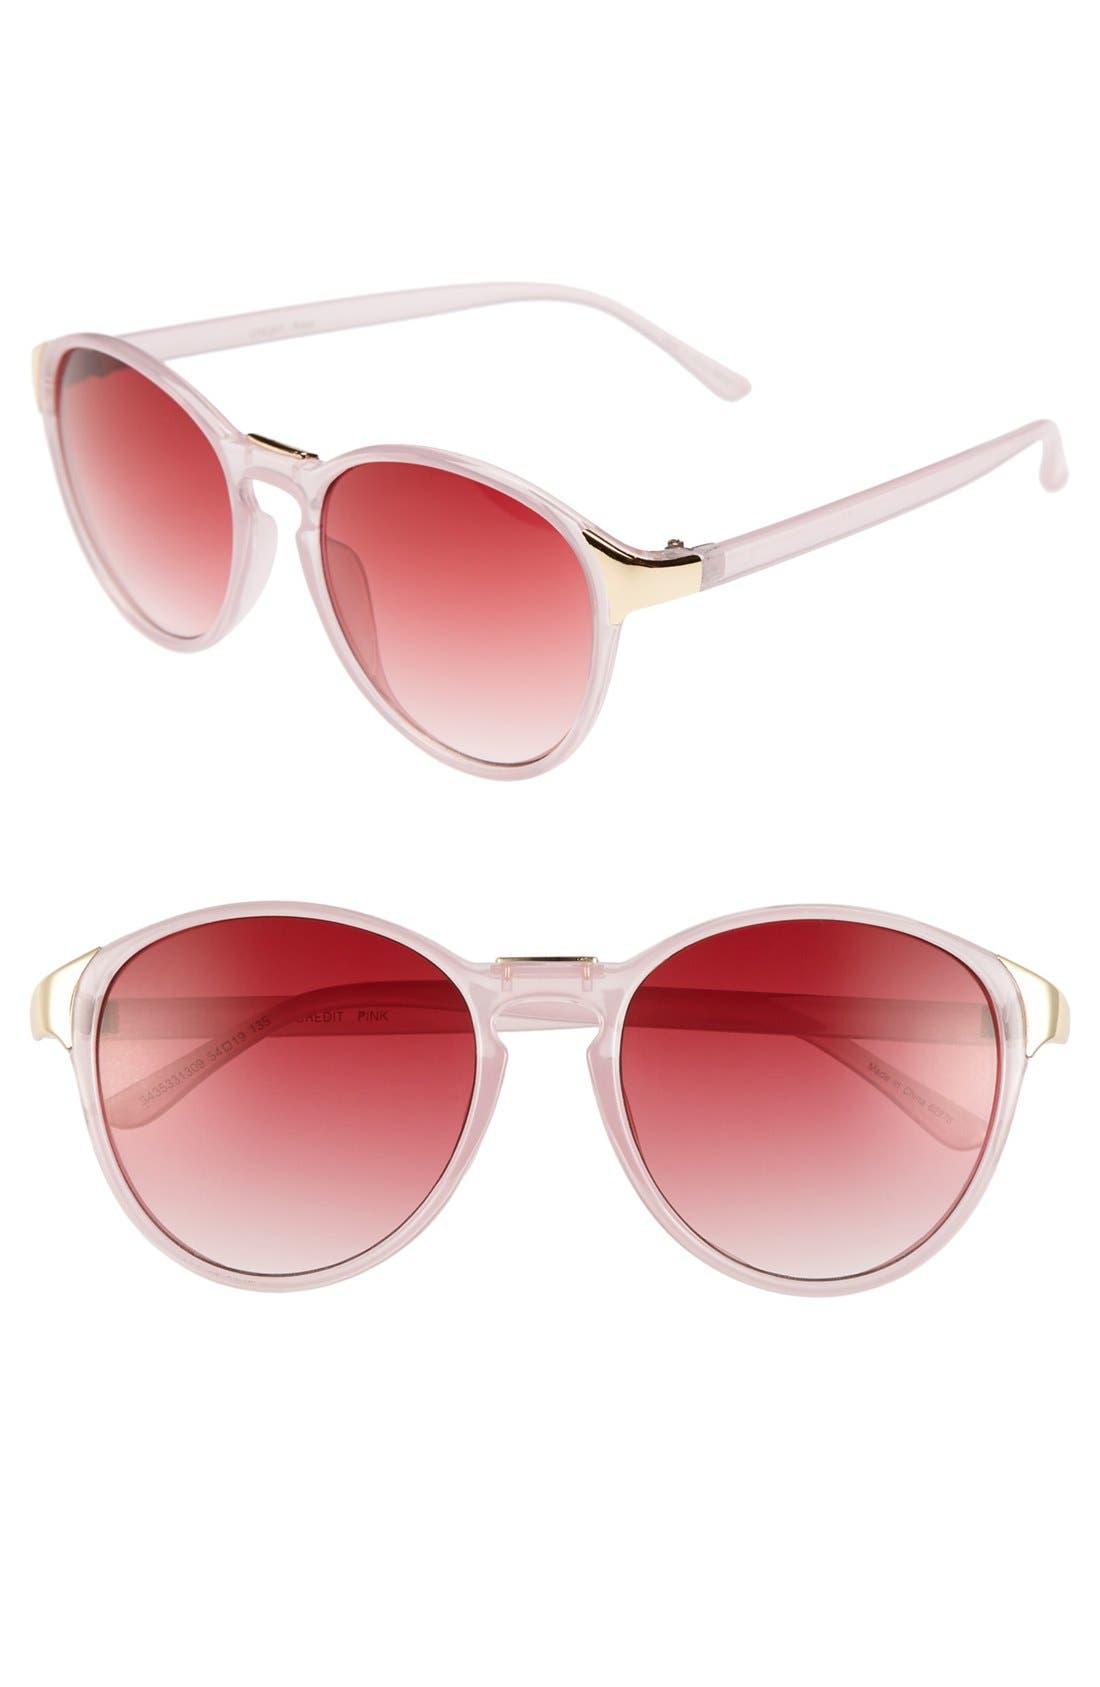 Main Image - Outlook Eyewear 'Credit' 54mm Sunglasses